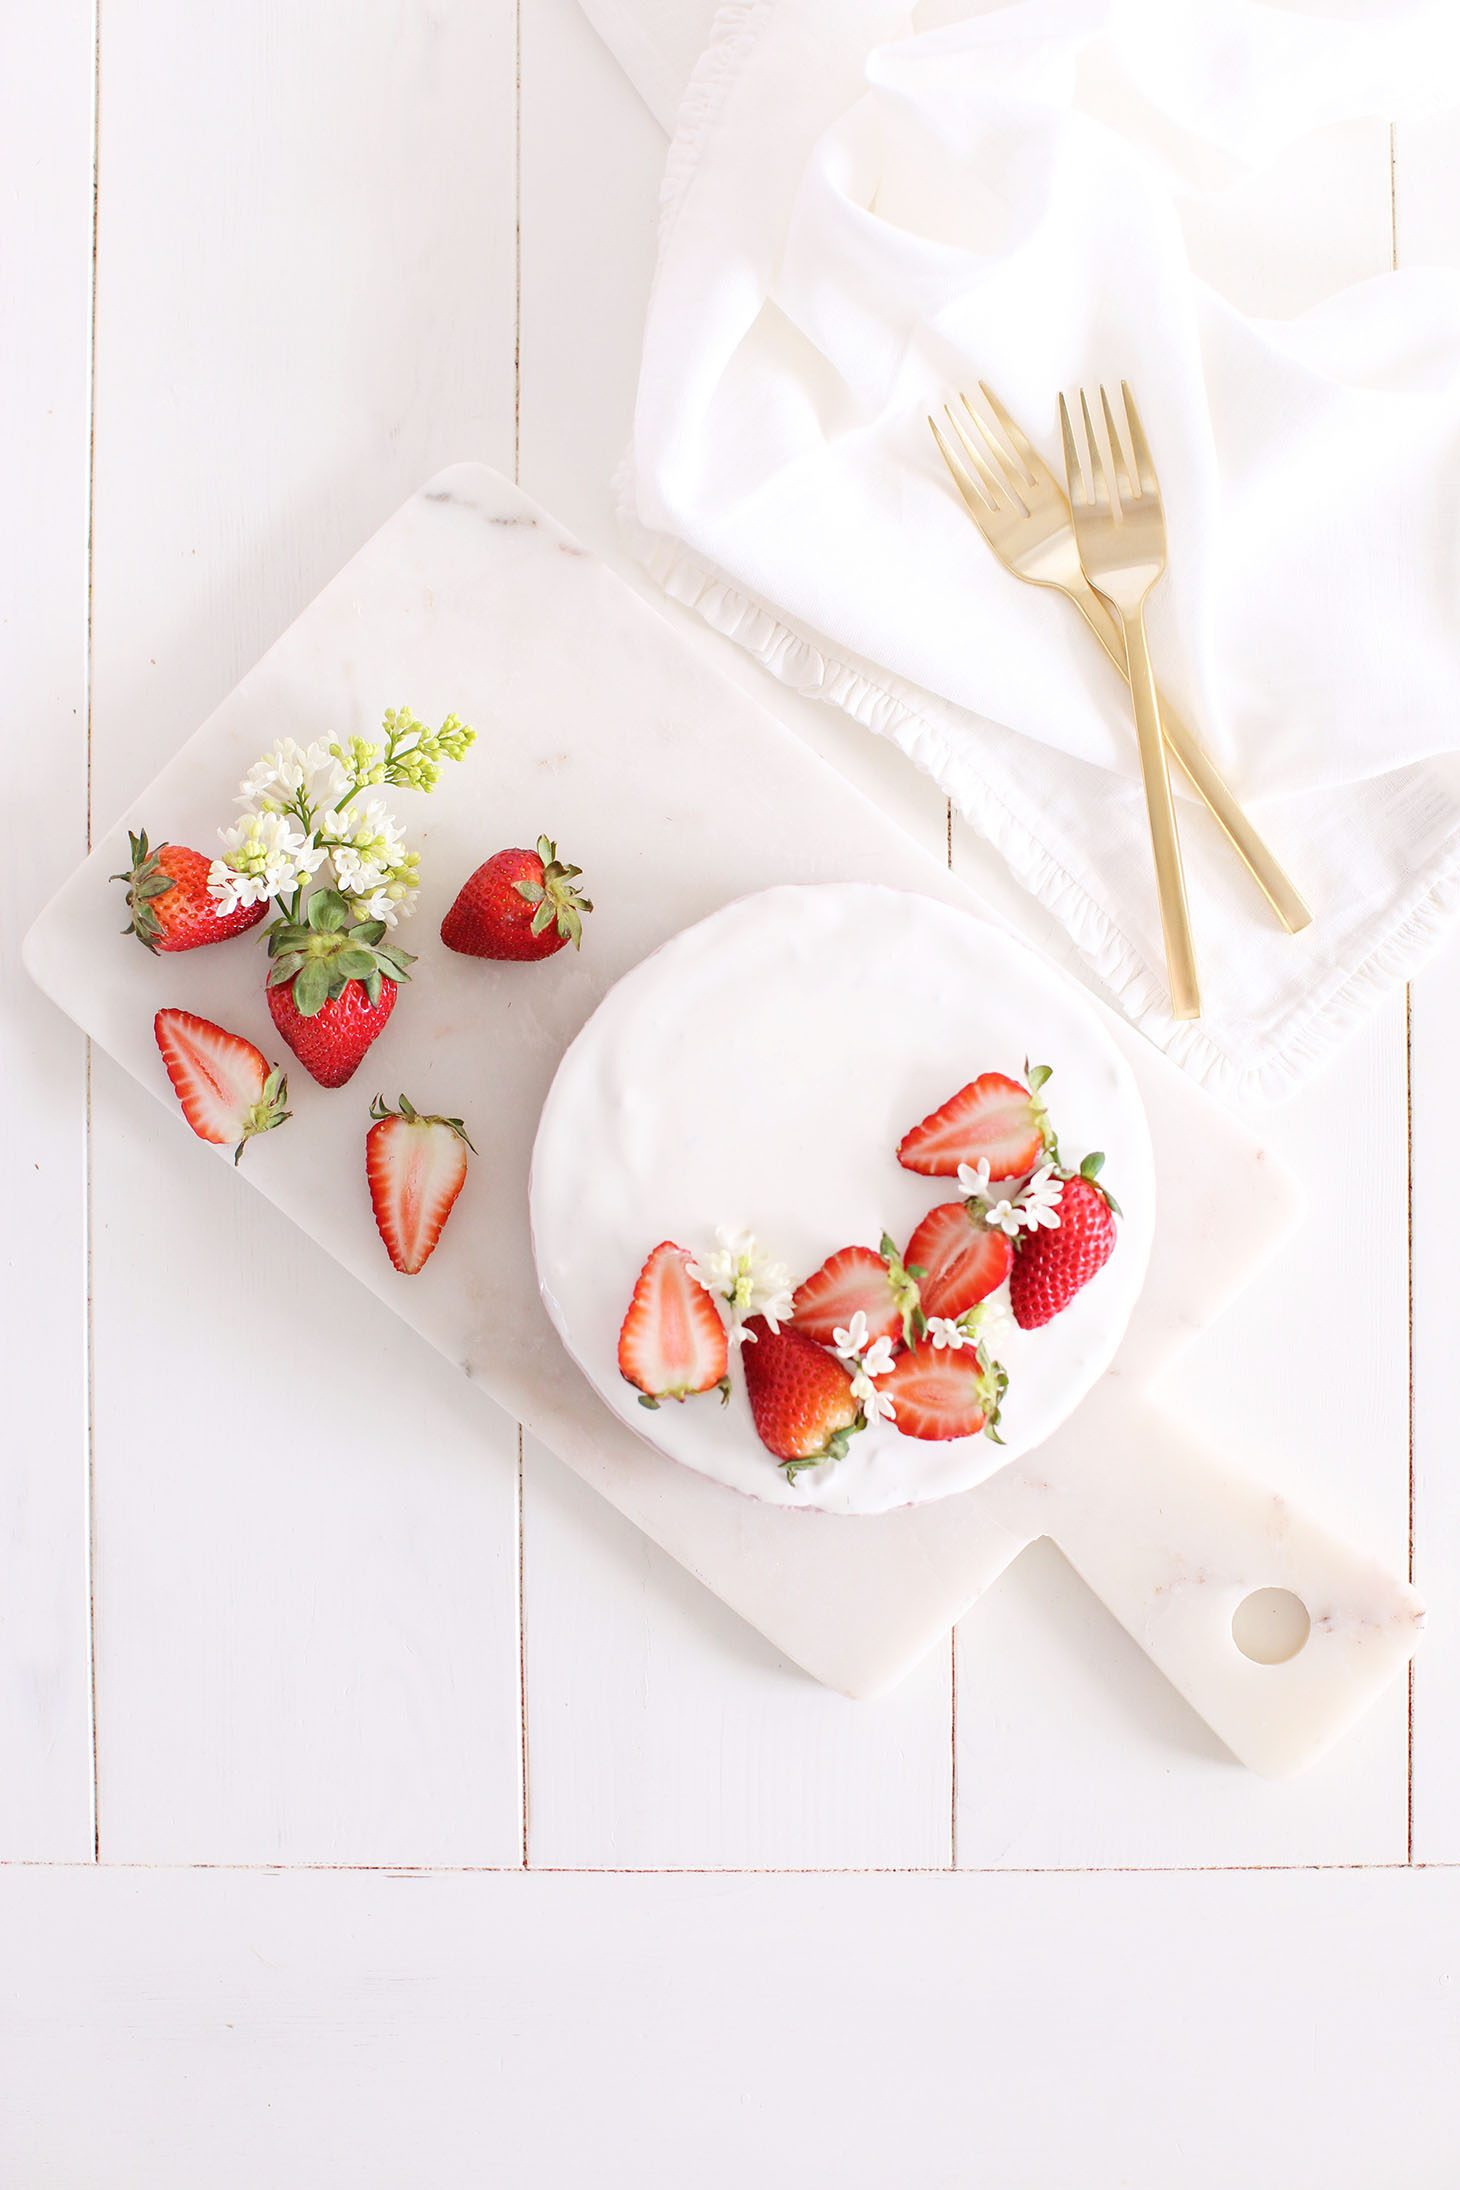 Berry Cheesecake garnished with strawberries.